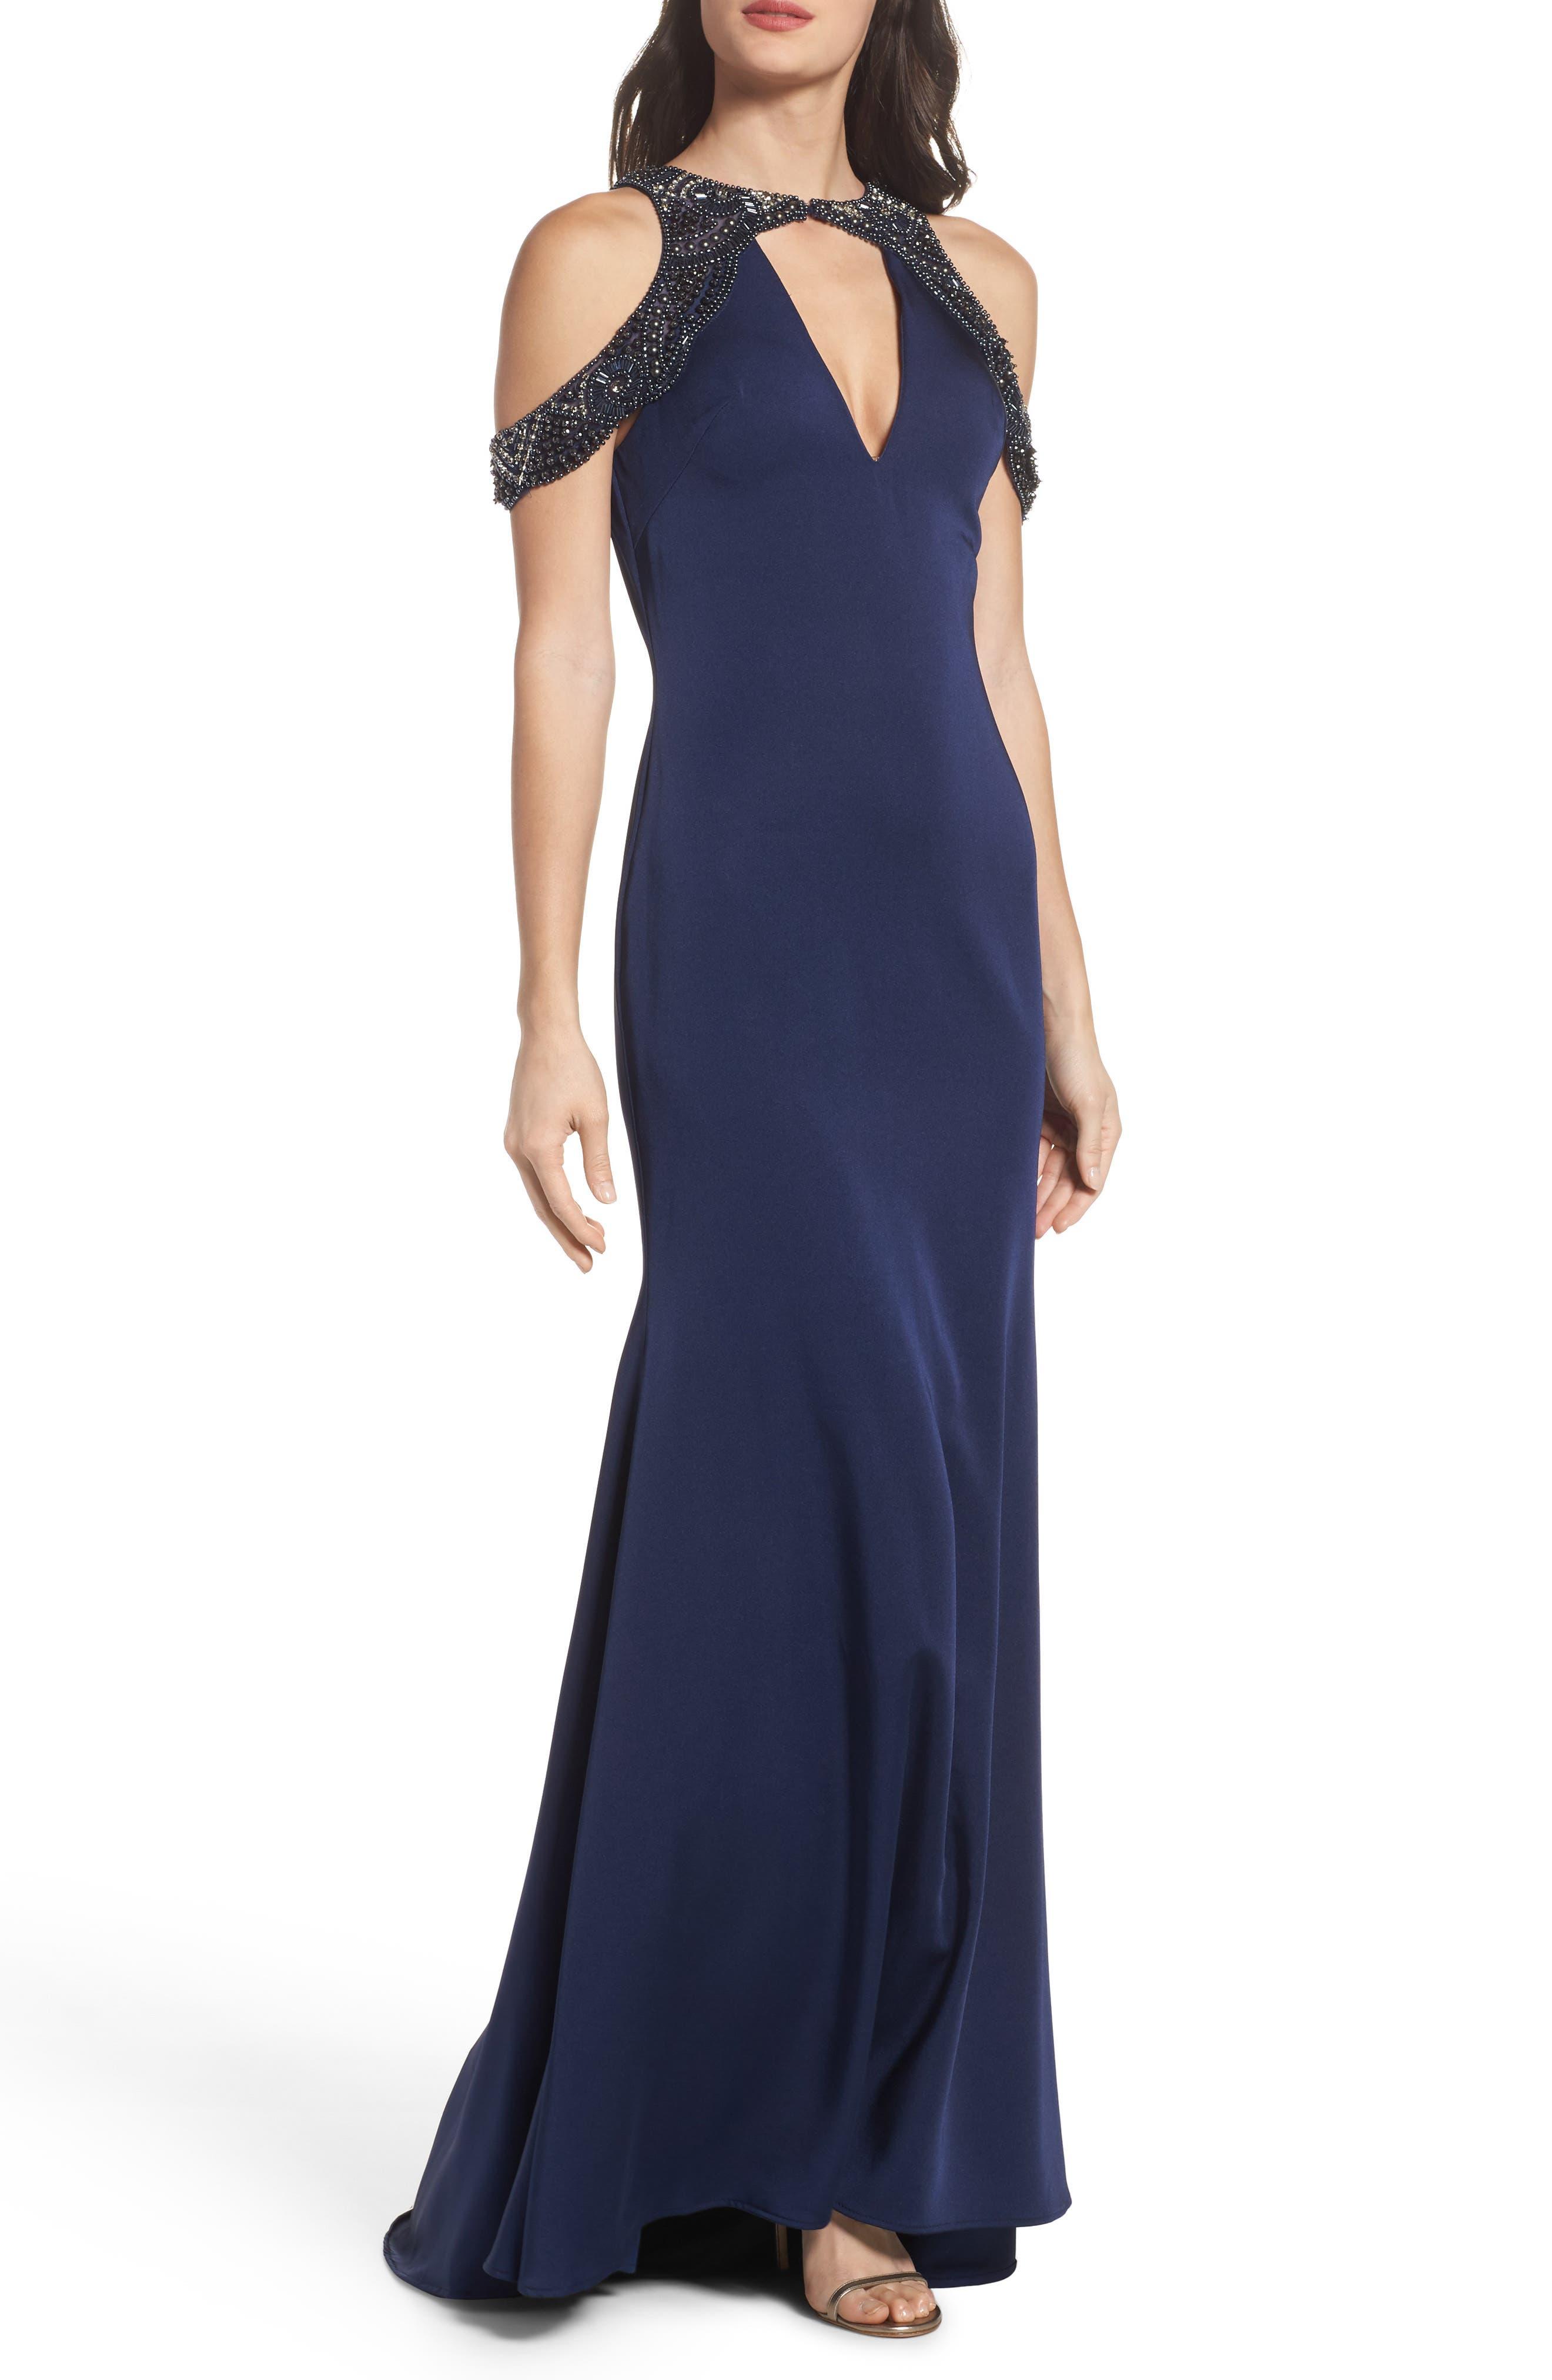 Main Image - Ieena for Mac Duggal Embellished Cold Shoulder Gown